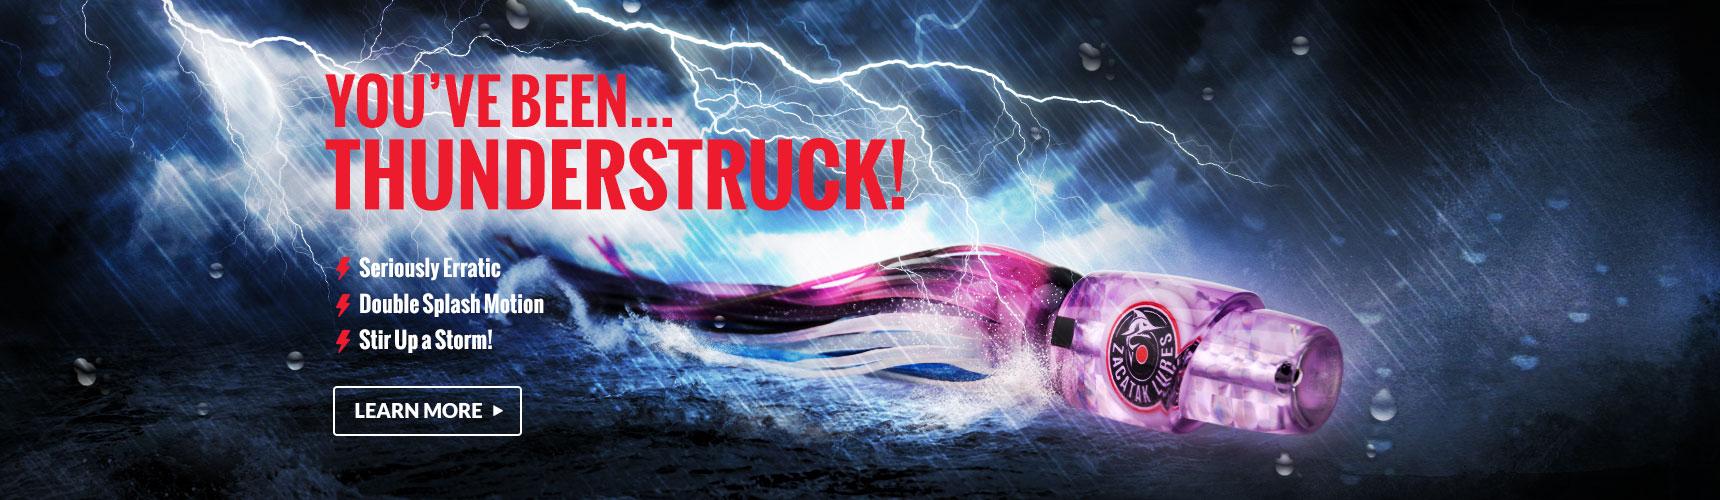 Thunderstruck Game Fishing Lure